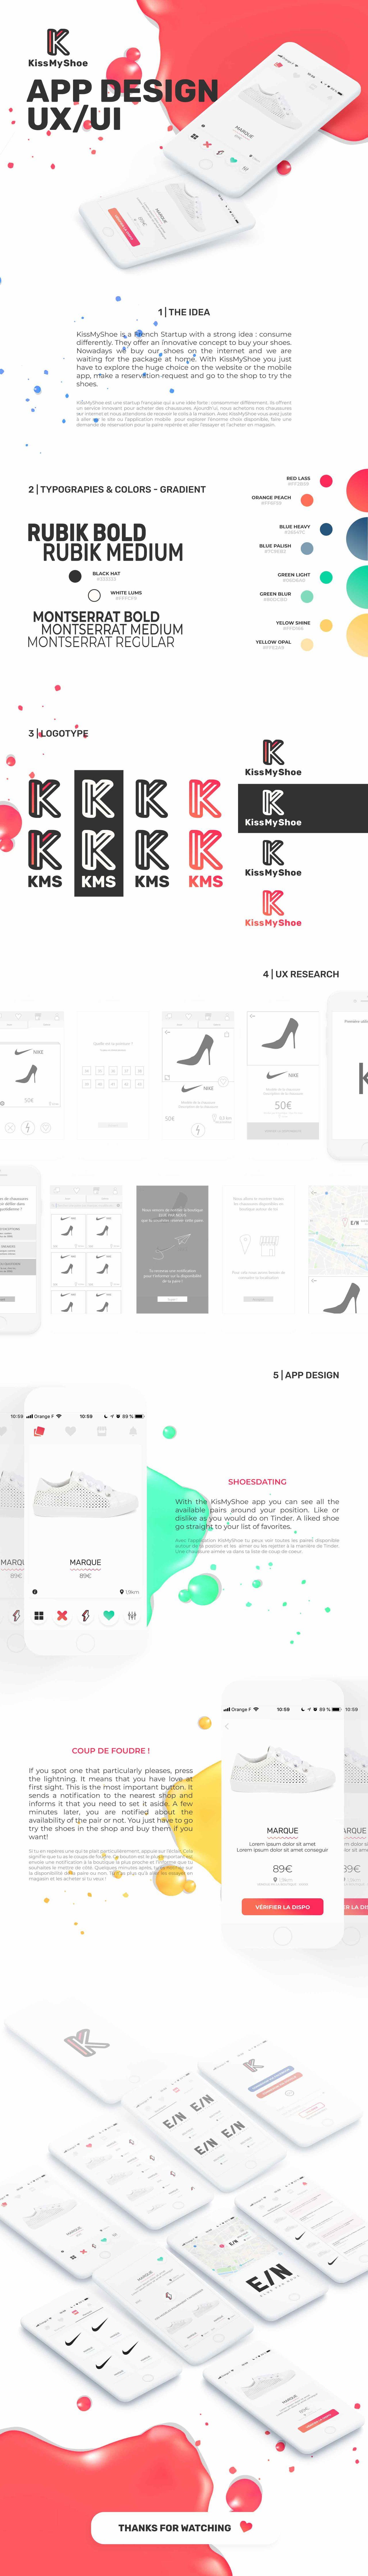 UX / UI Design - KissMyShoe